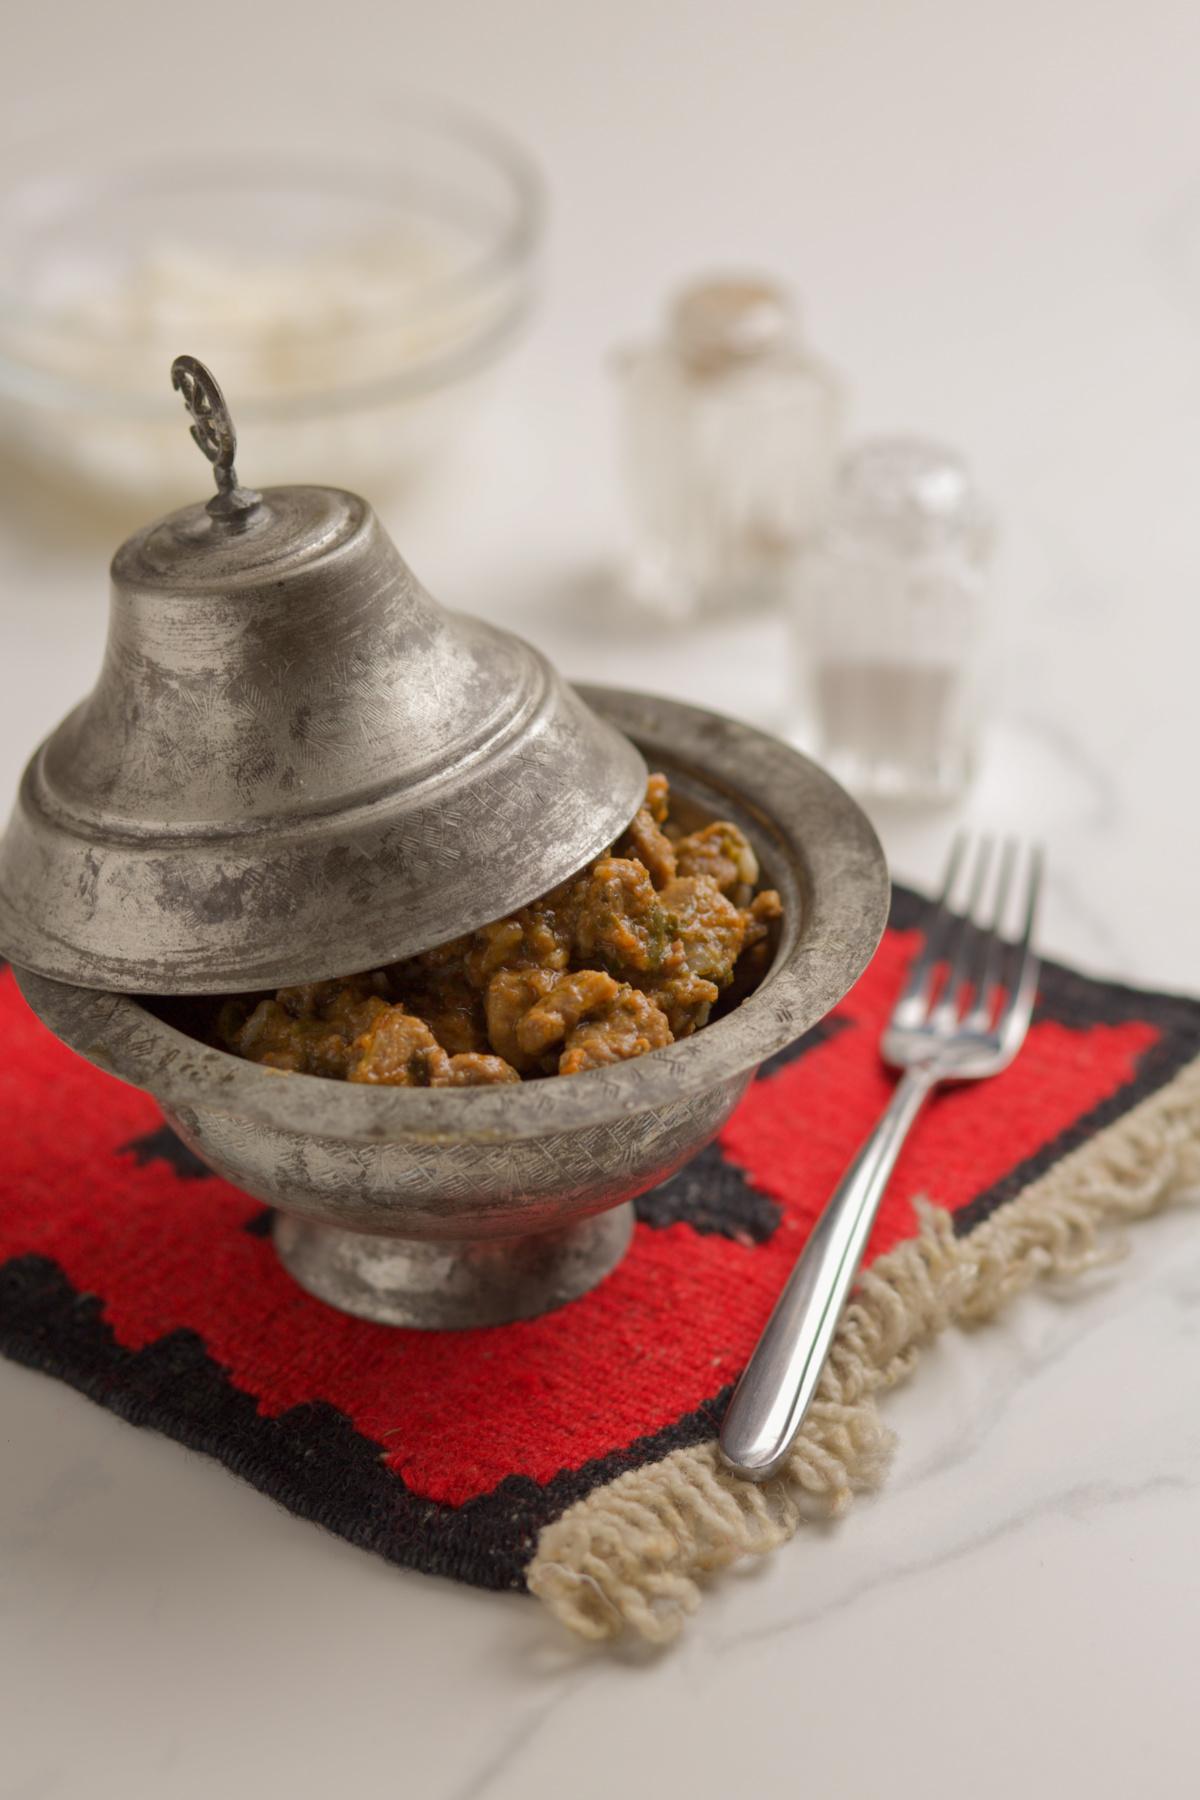 Sitni ćevap serviran u sahanu.